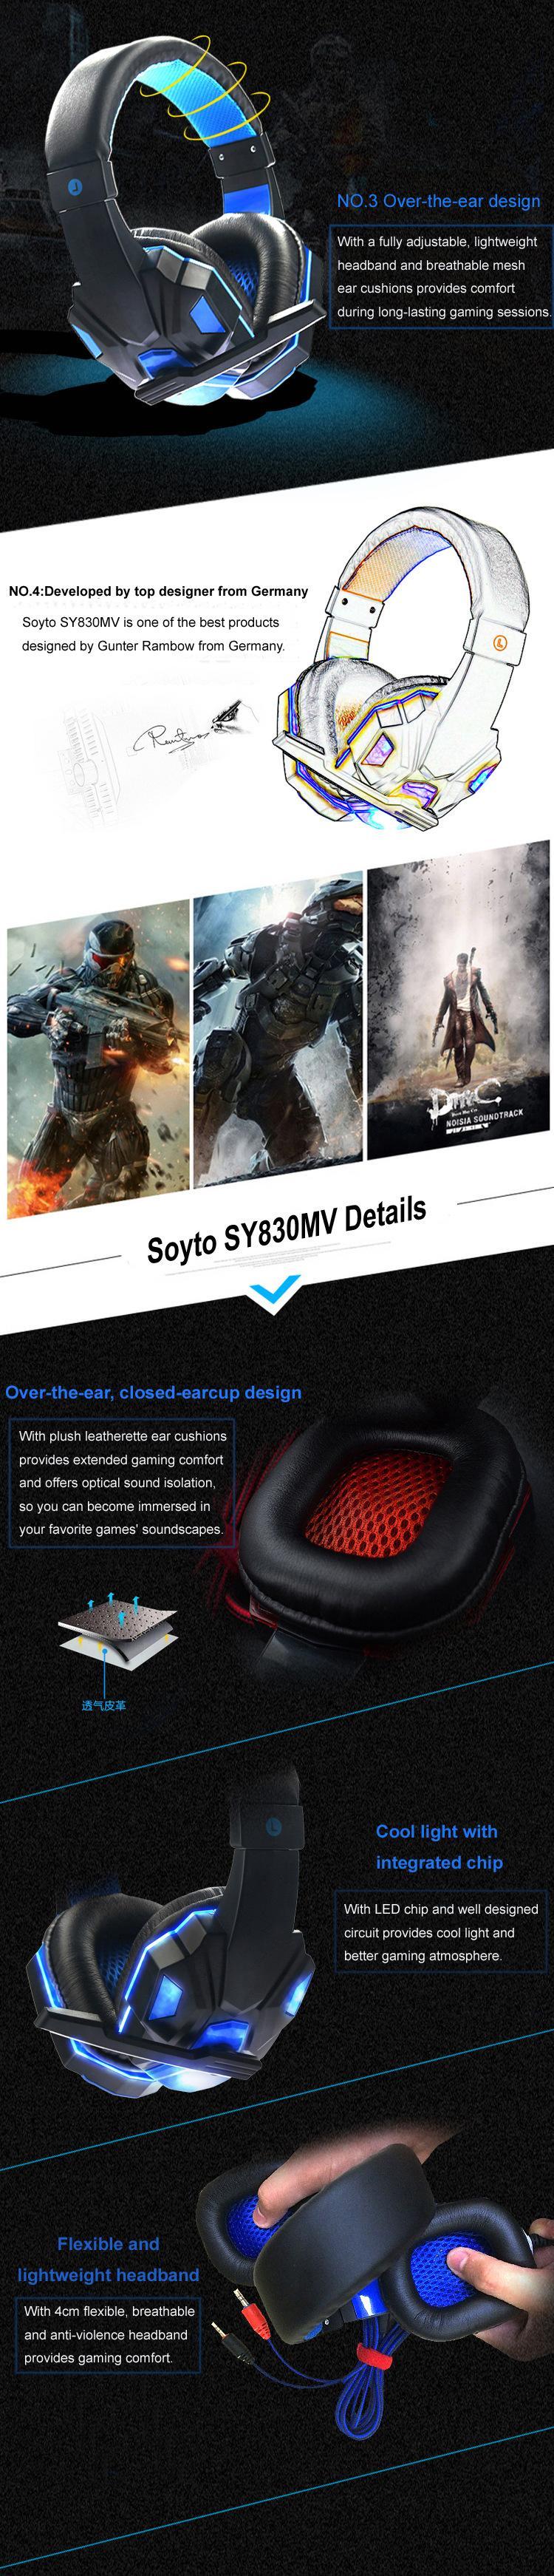 Großhandel NEUE SY830MV Computerspiele Kopfhörer Headset Internet ...